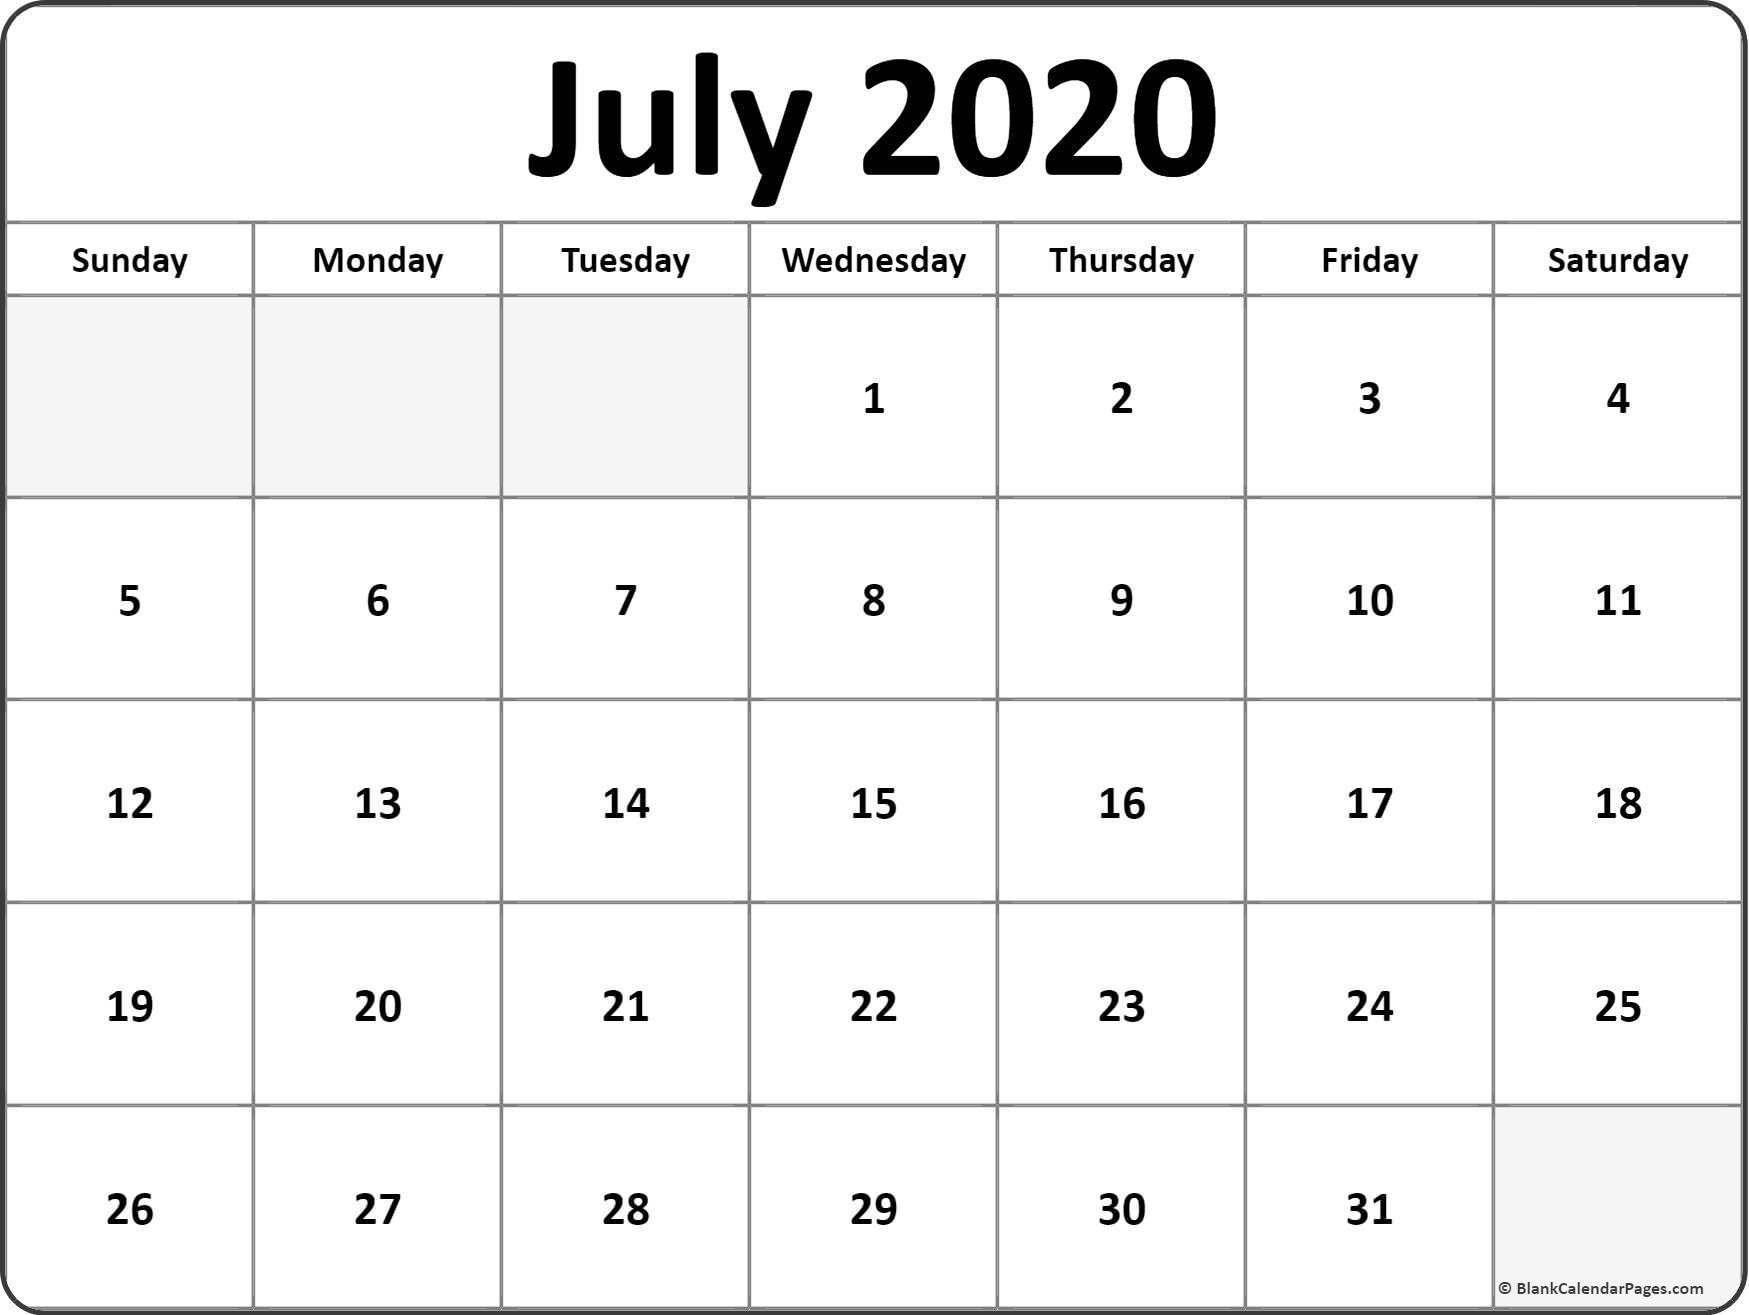 Printable Calendar 2020 by Month July 2020 Calendar